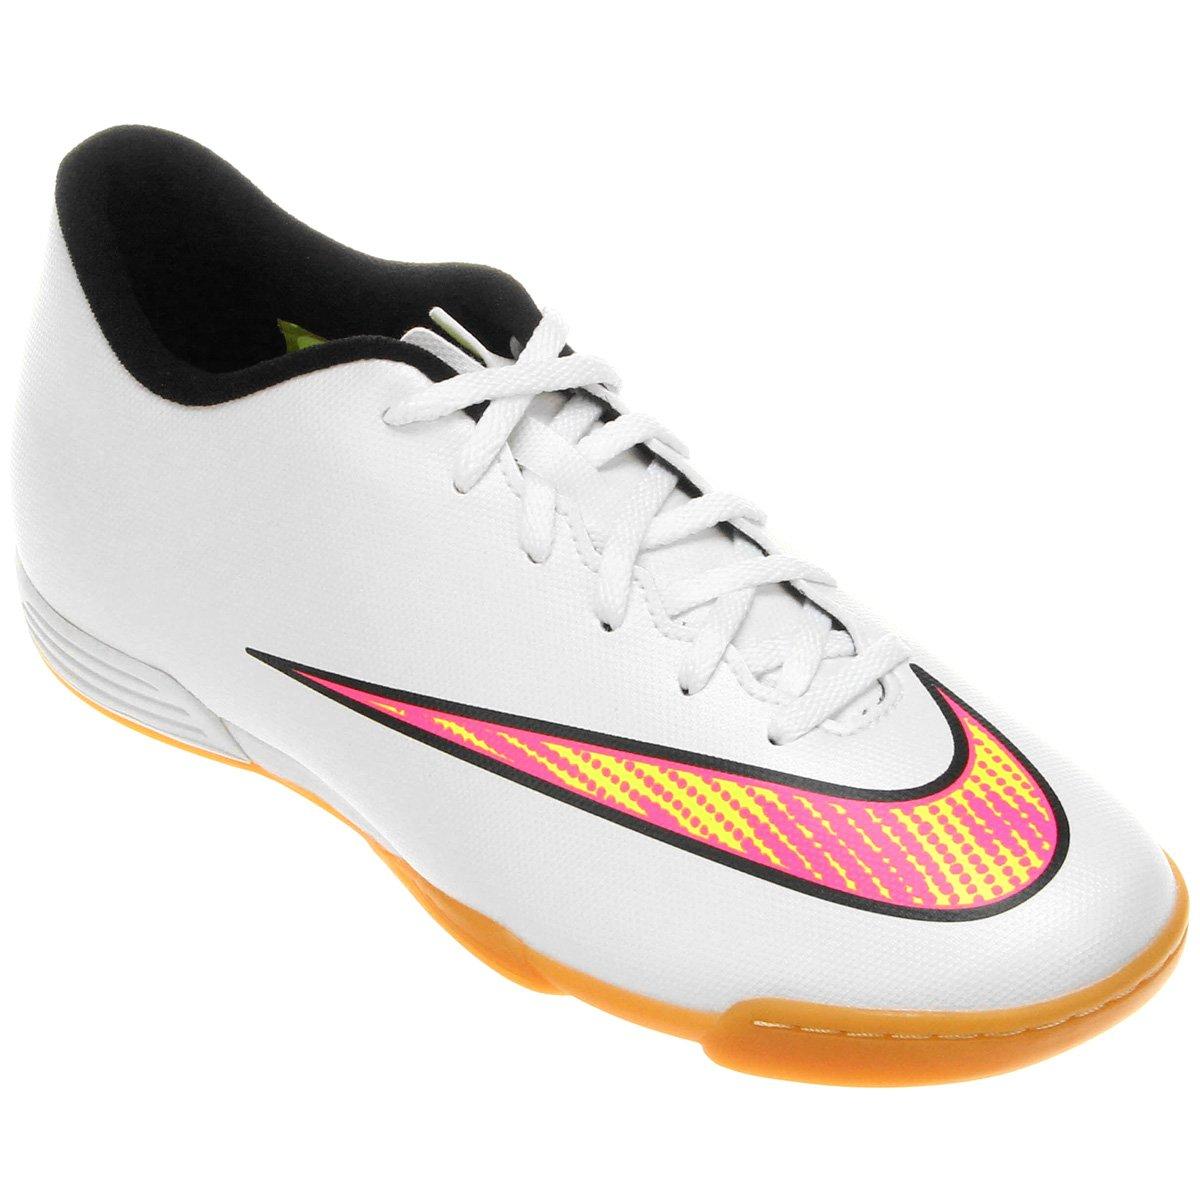 092a21e1fe243 Chuteira Futsal Nike Mercurial Vortex 2 IC - Compre Agora